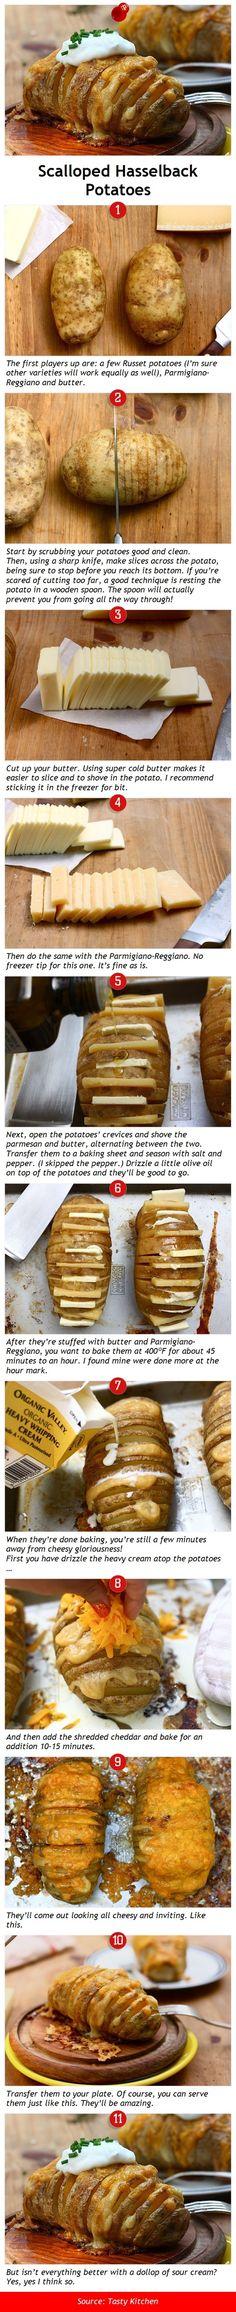 Interesting way to do potatoes